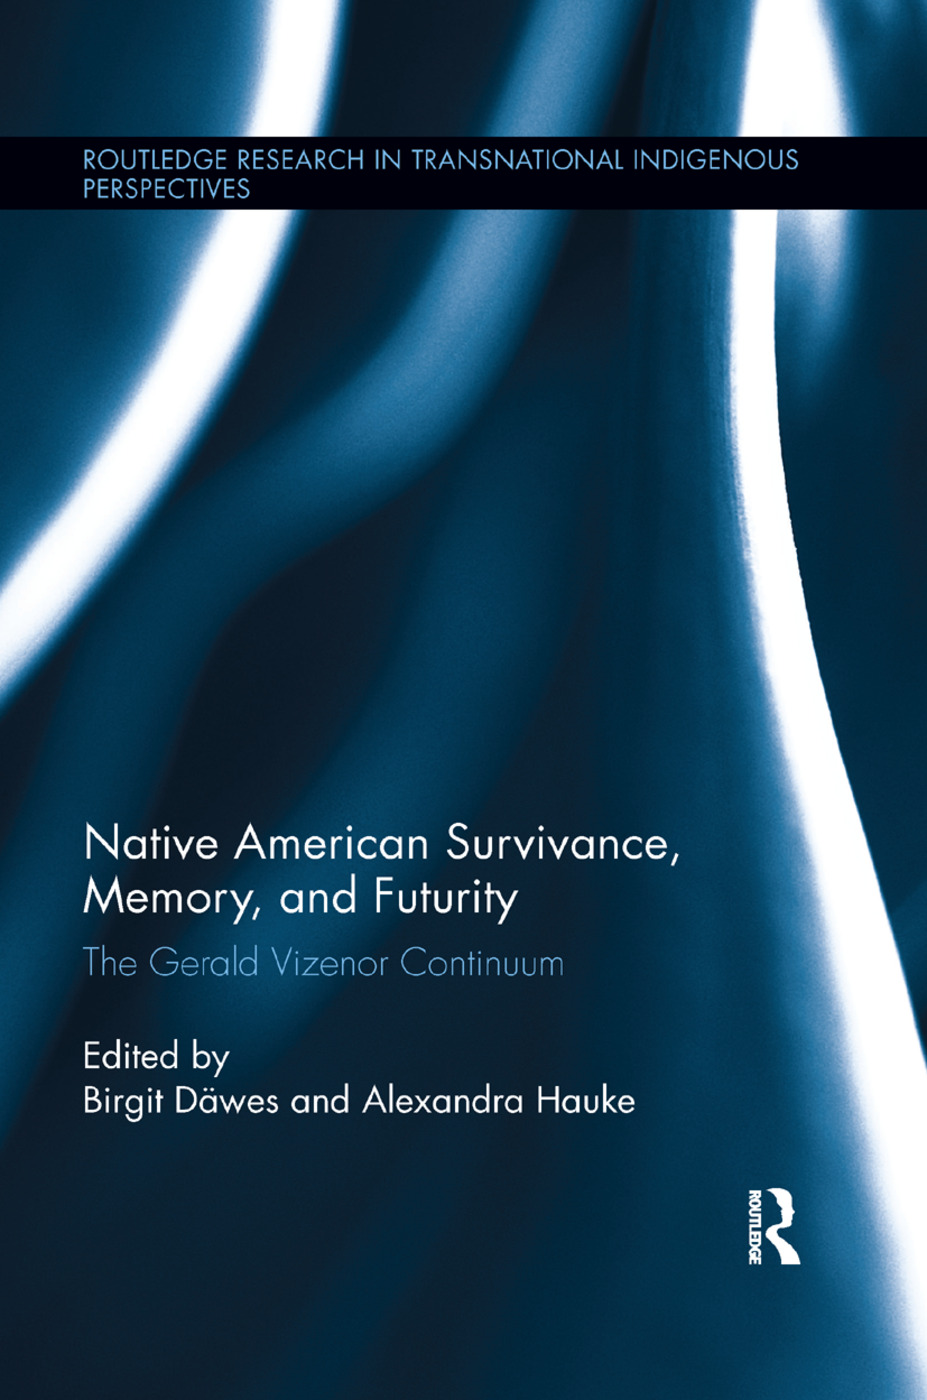 Native American Survivance, Memory, and Futurity: The Gerald Vizenor Continuum book cover